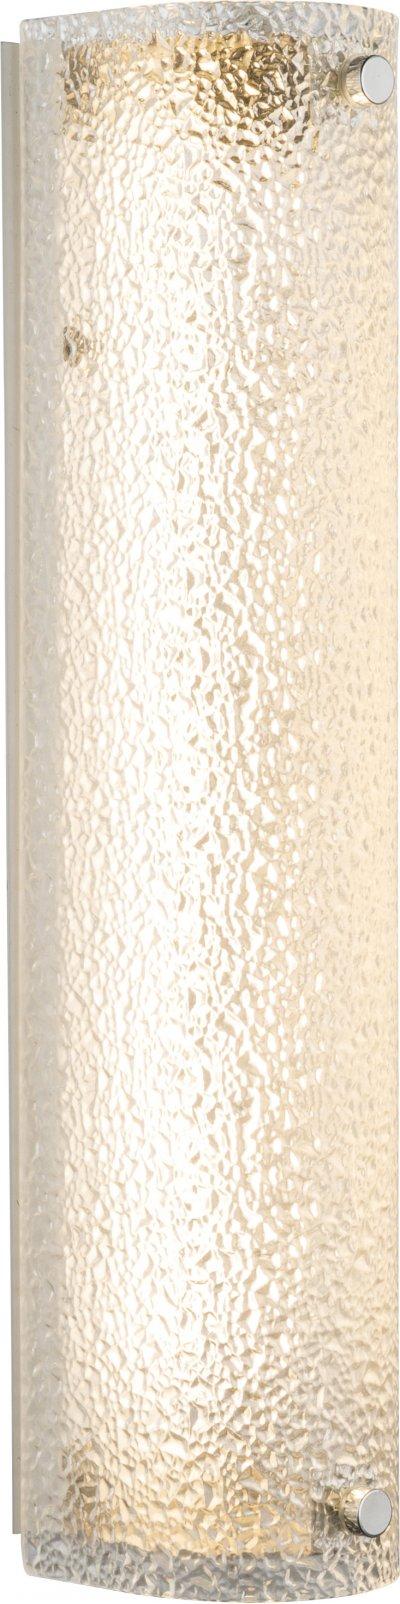 Светильник настенный Globo 40420-14WОжидается<br><br><br>Тип цоколя: LED<br>Цвет арматуры: хром серебристый<br>Ширина, мм: 350<br>Высота, мм: 70